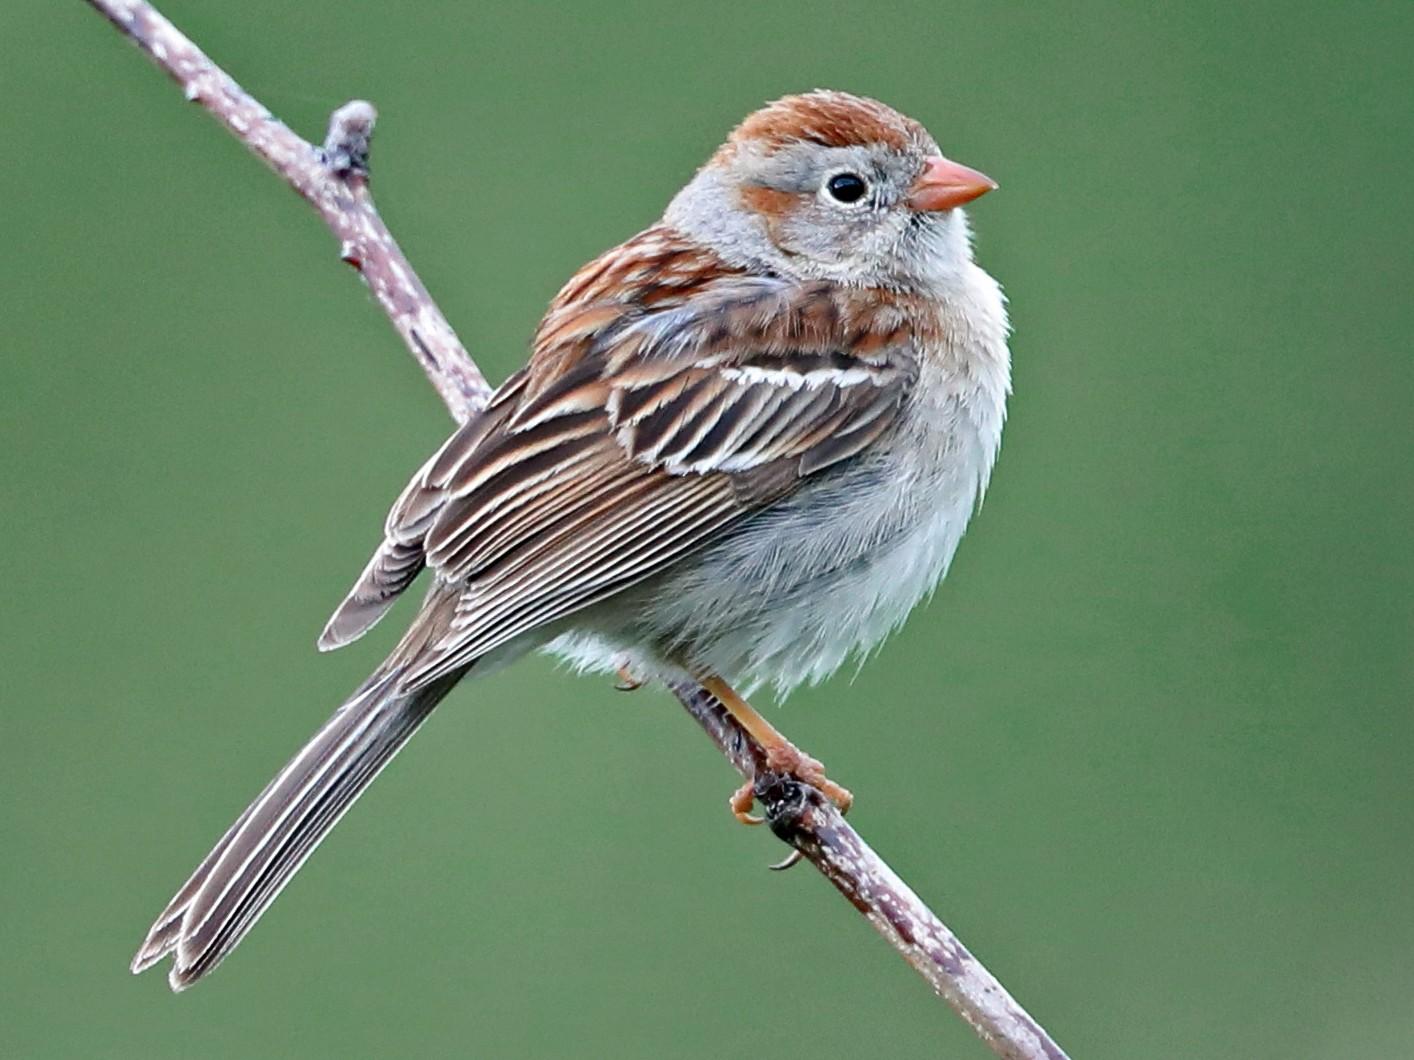 Field Sparrow - Daniel Jauvin